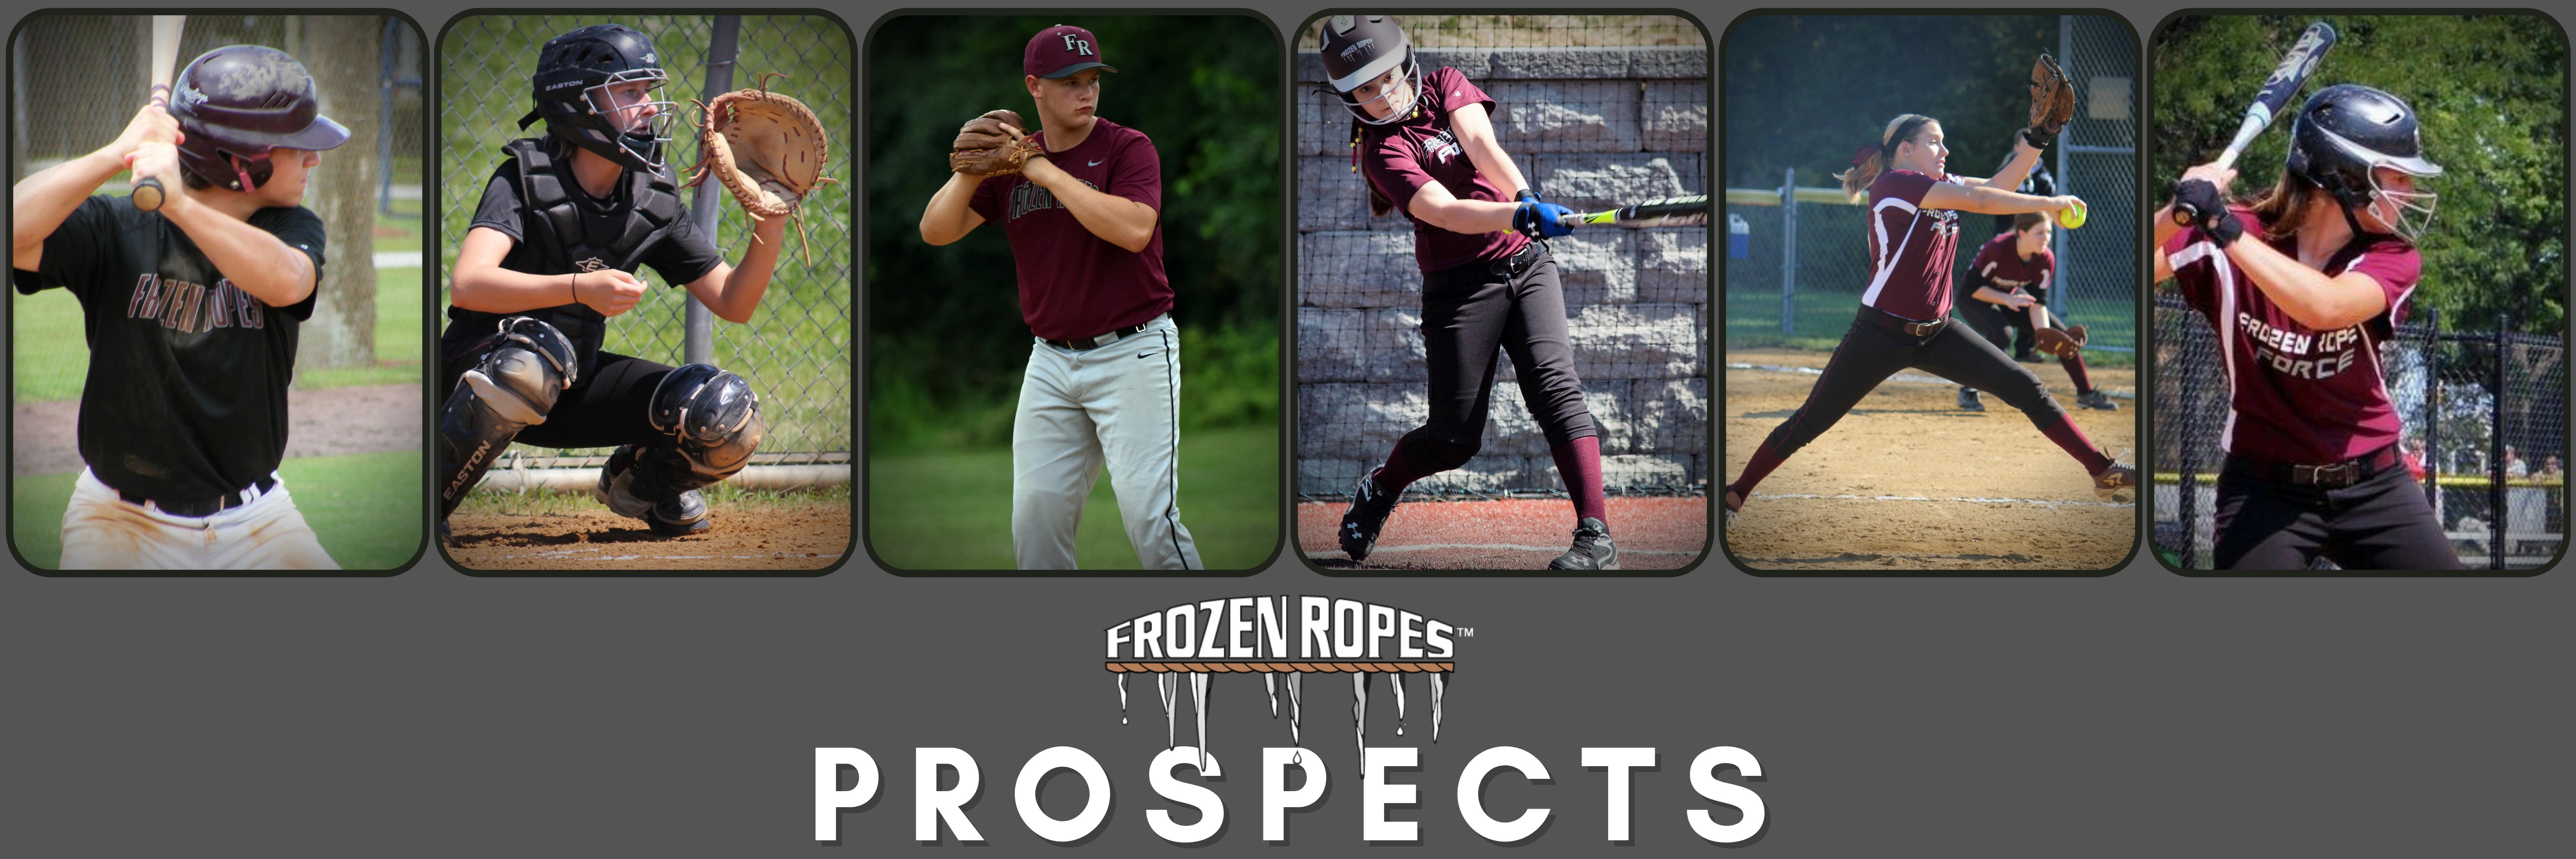 Frozen Ropes Prospects